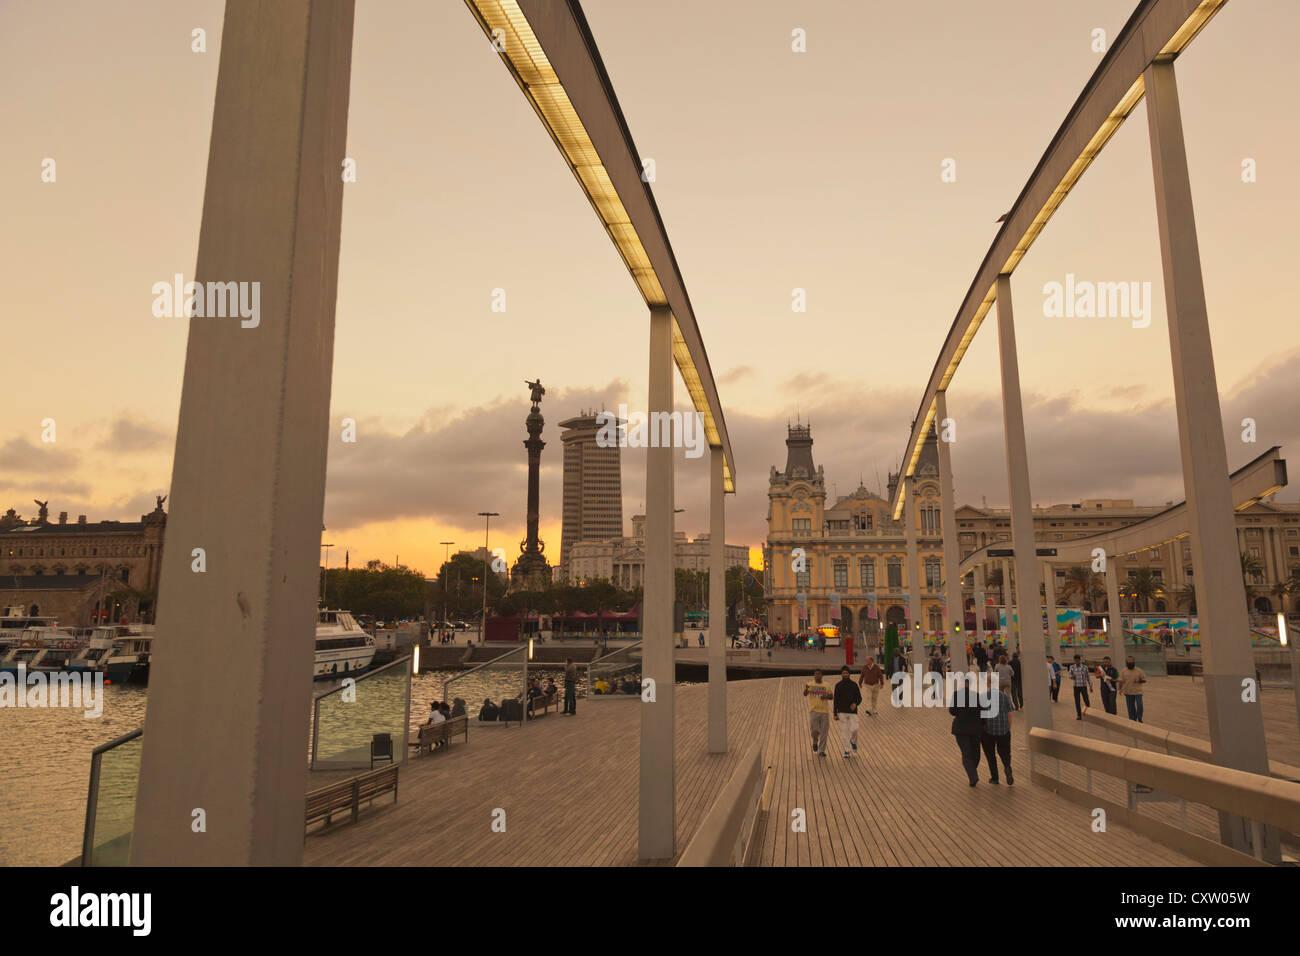 Barcelona, Spanien. Uferpromenade von Rambla de Mar gesehen. Stockbild